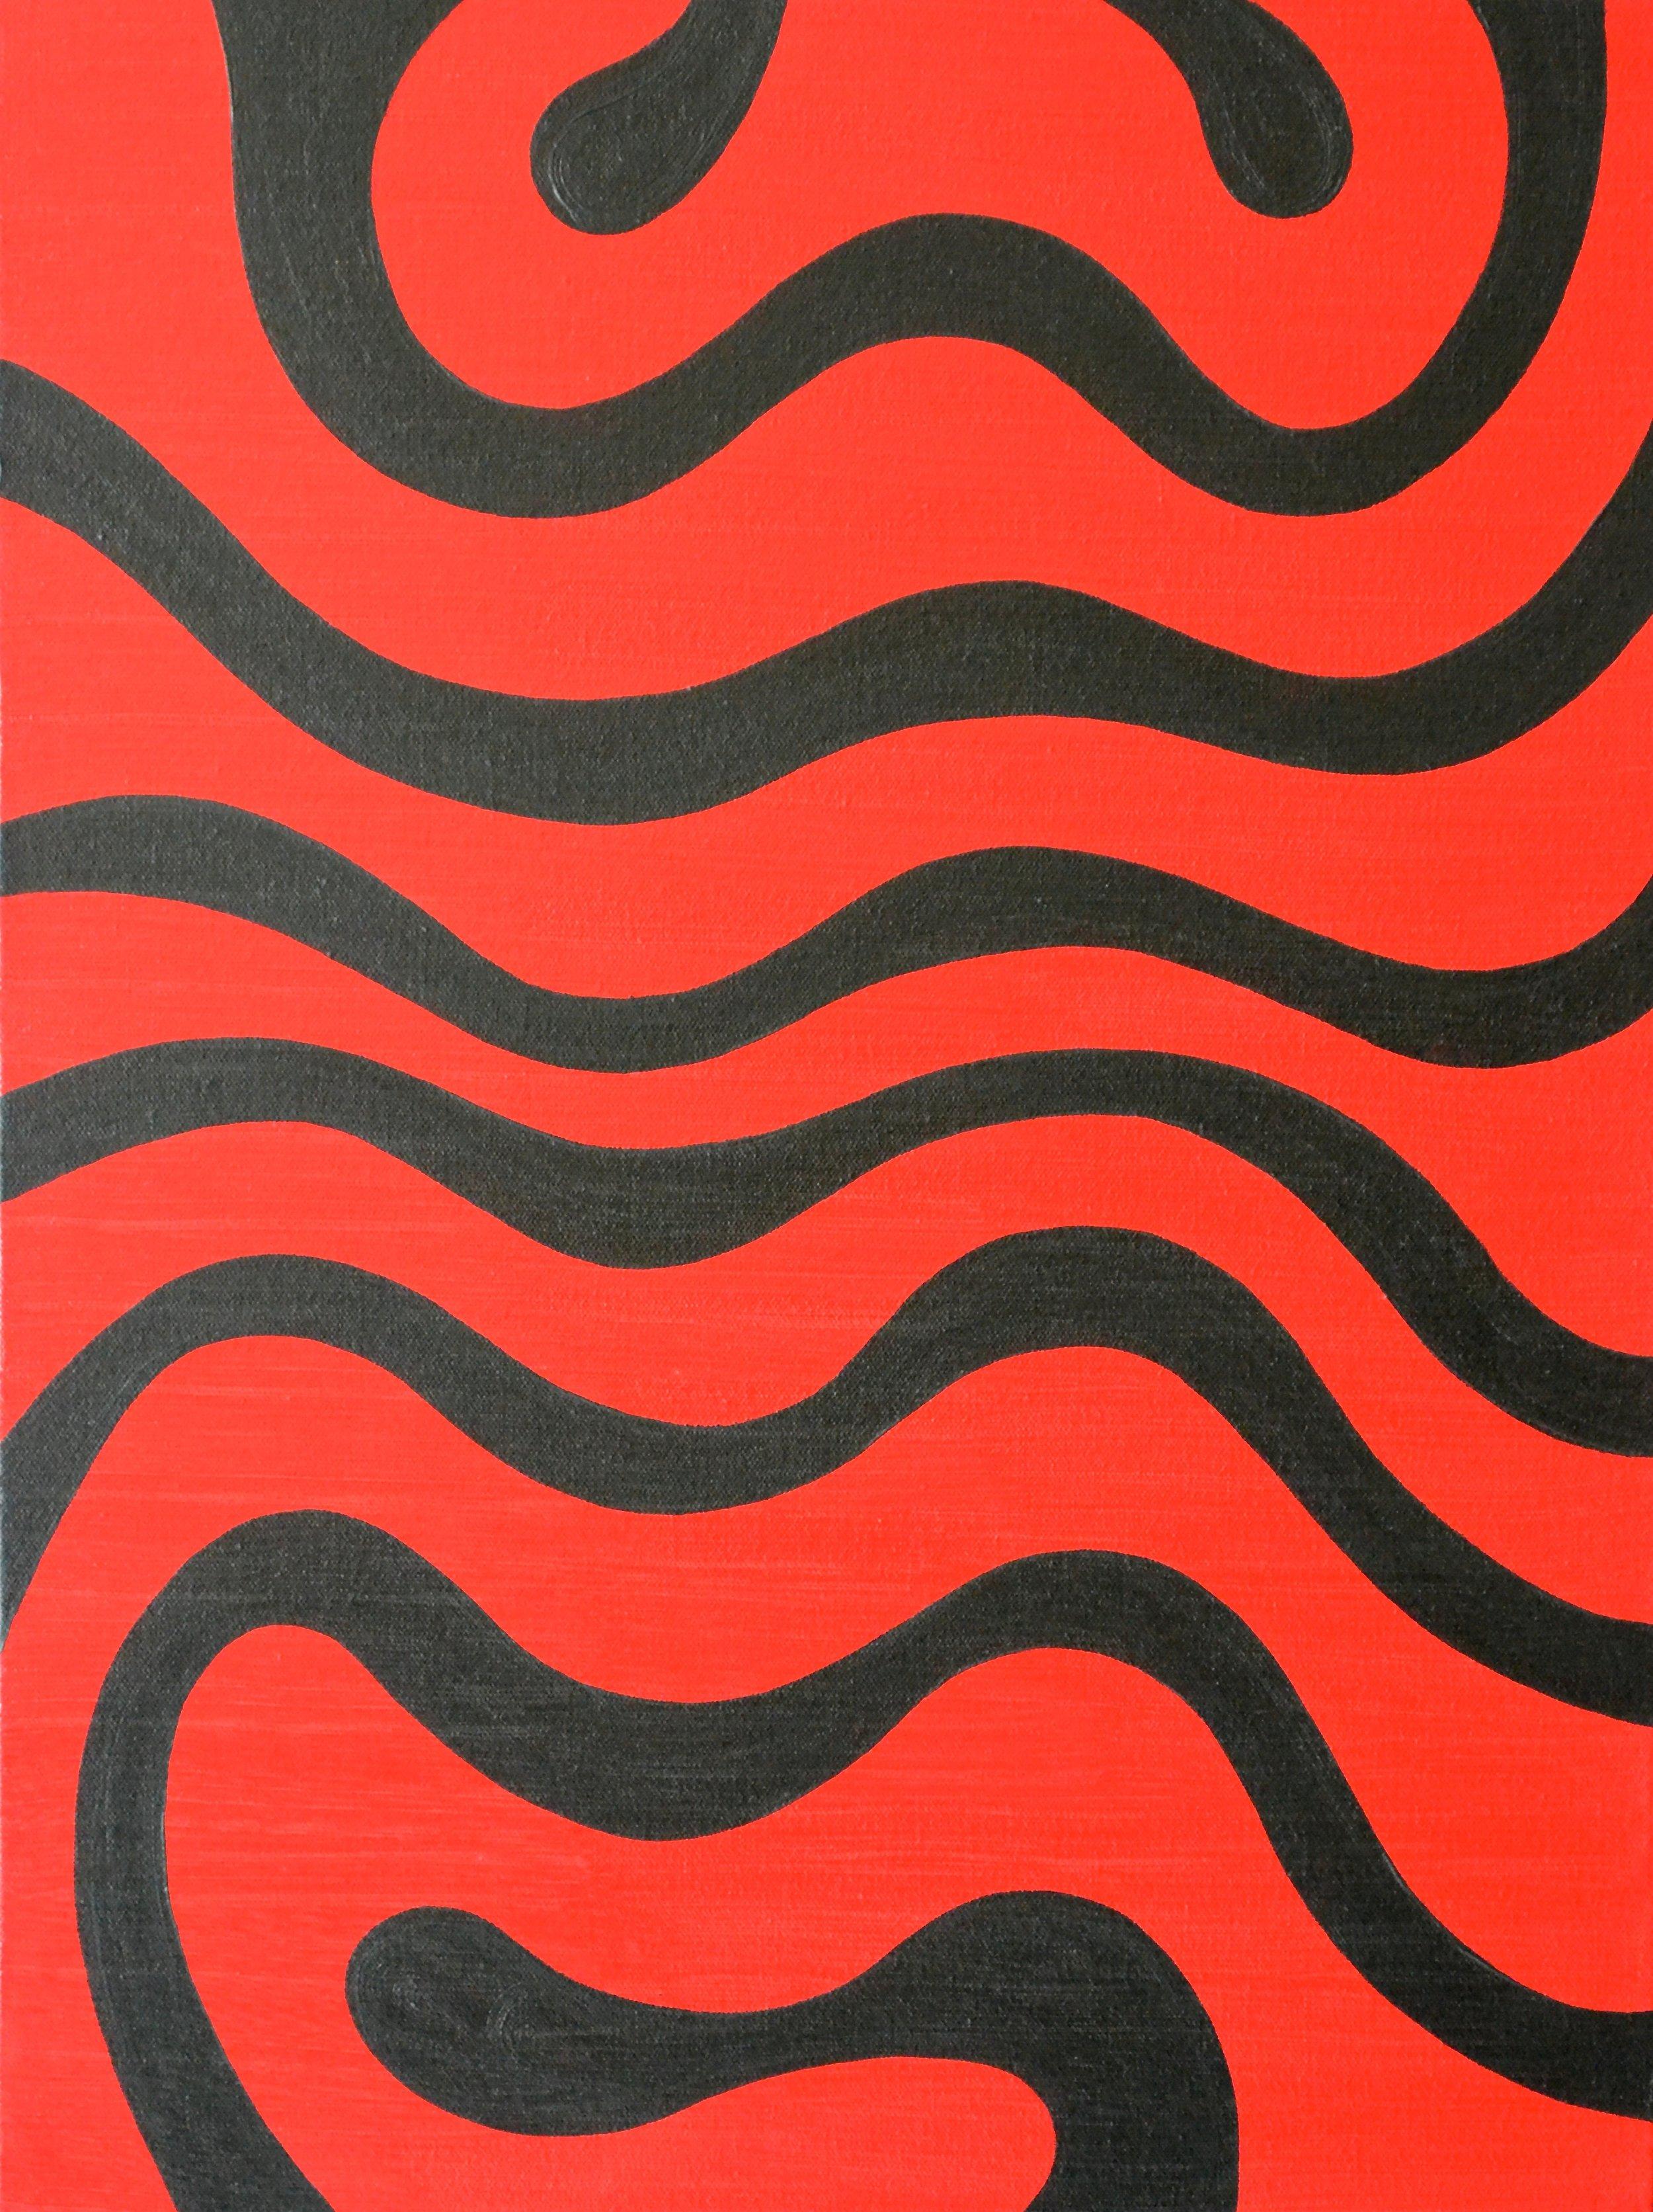 Armand Fogels-_Red Stripe_-18x24-oil-1st-2012-3500.00.jpg